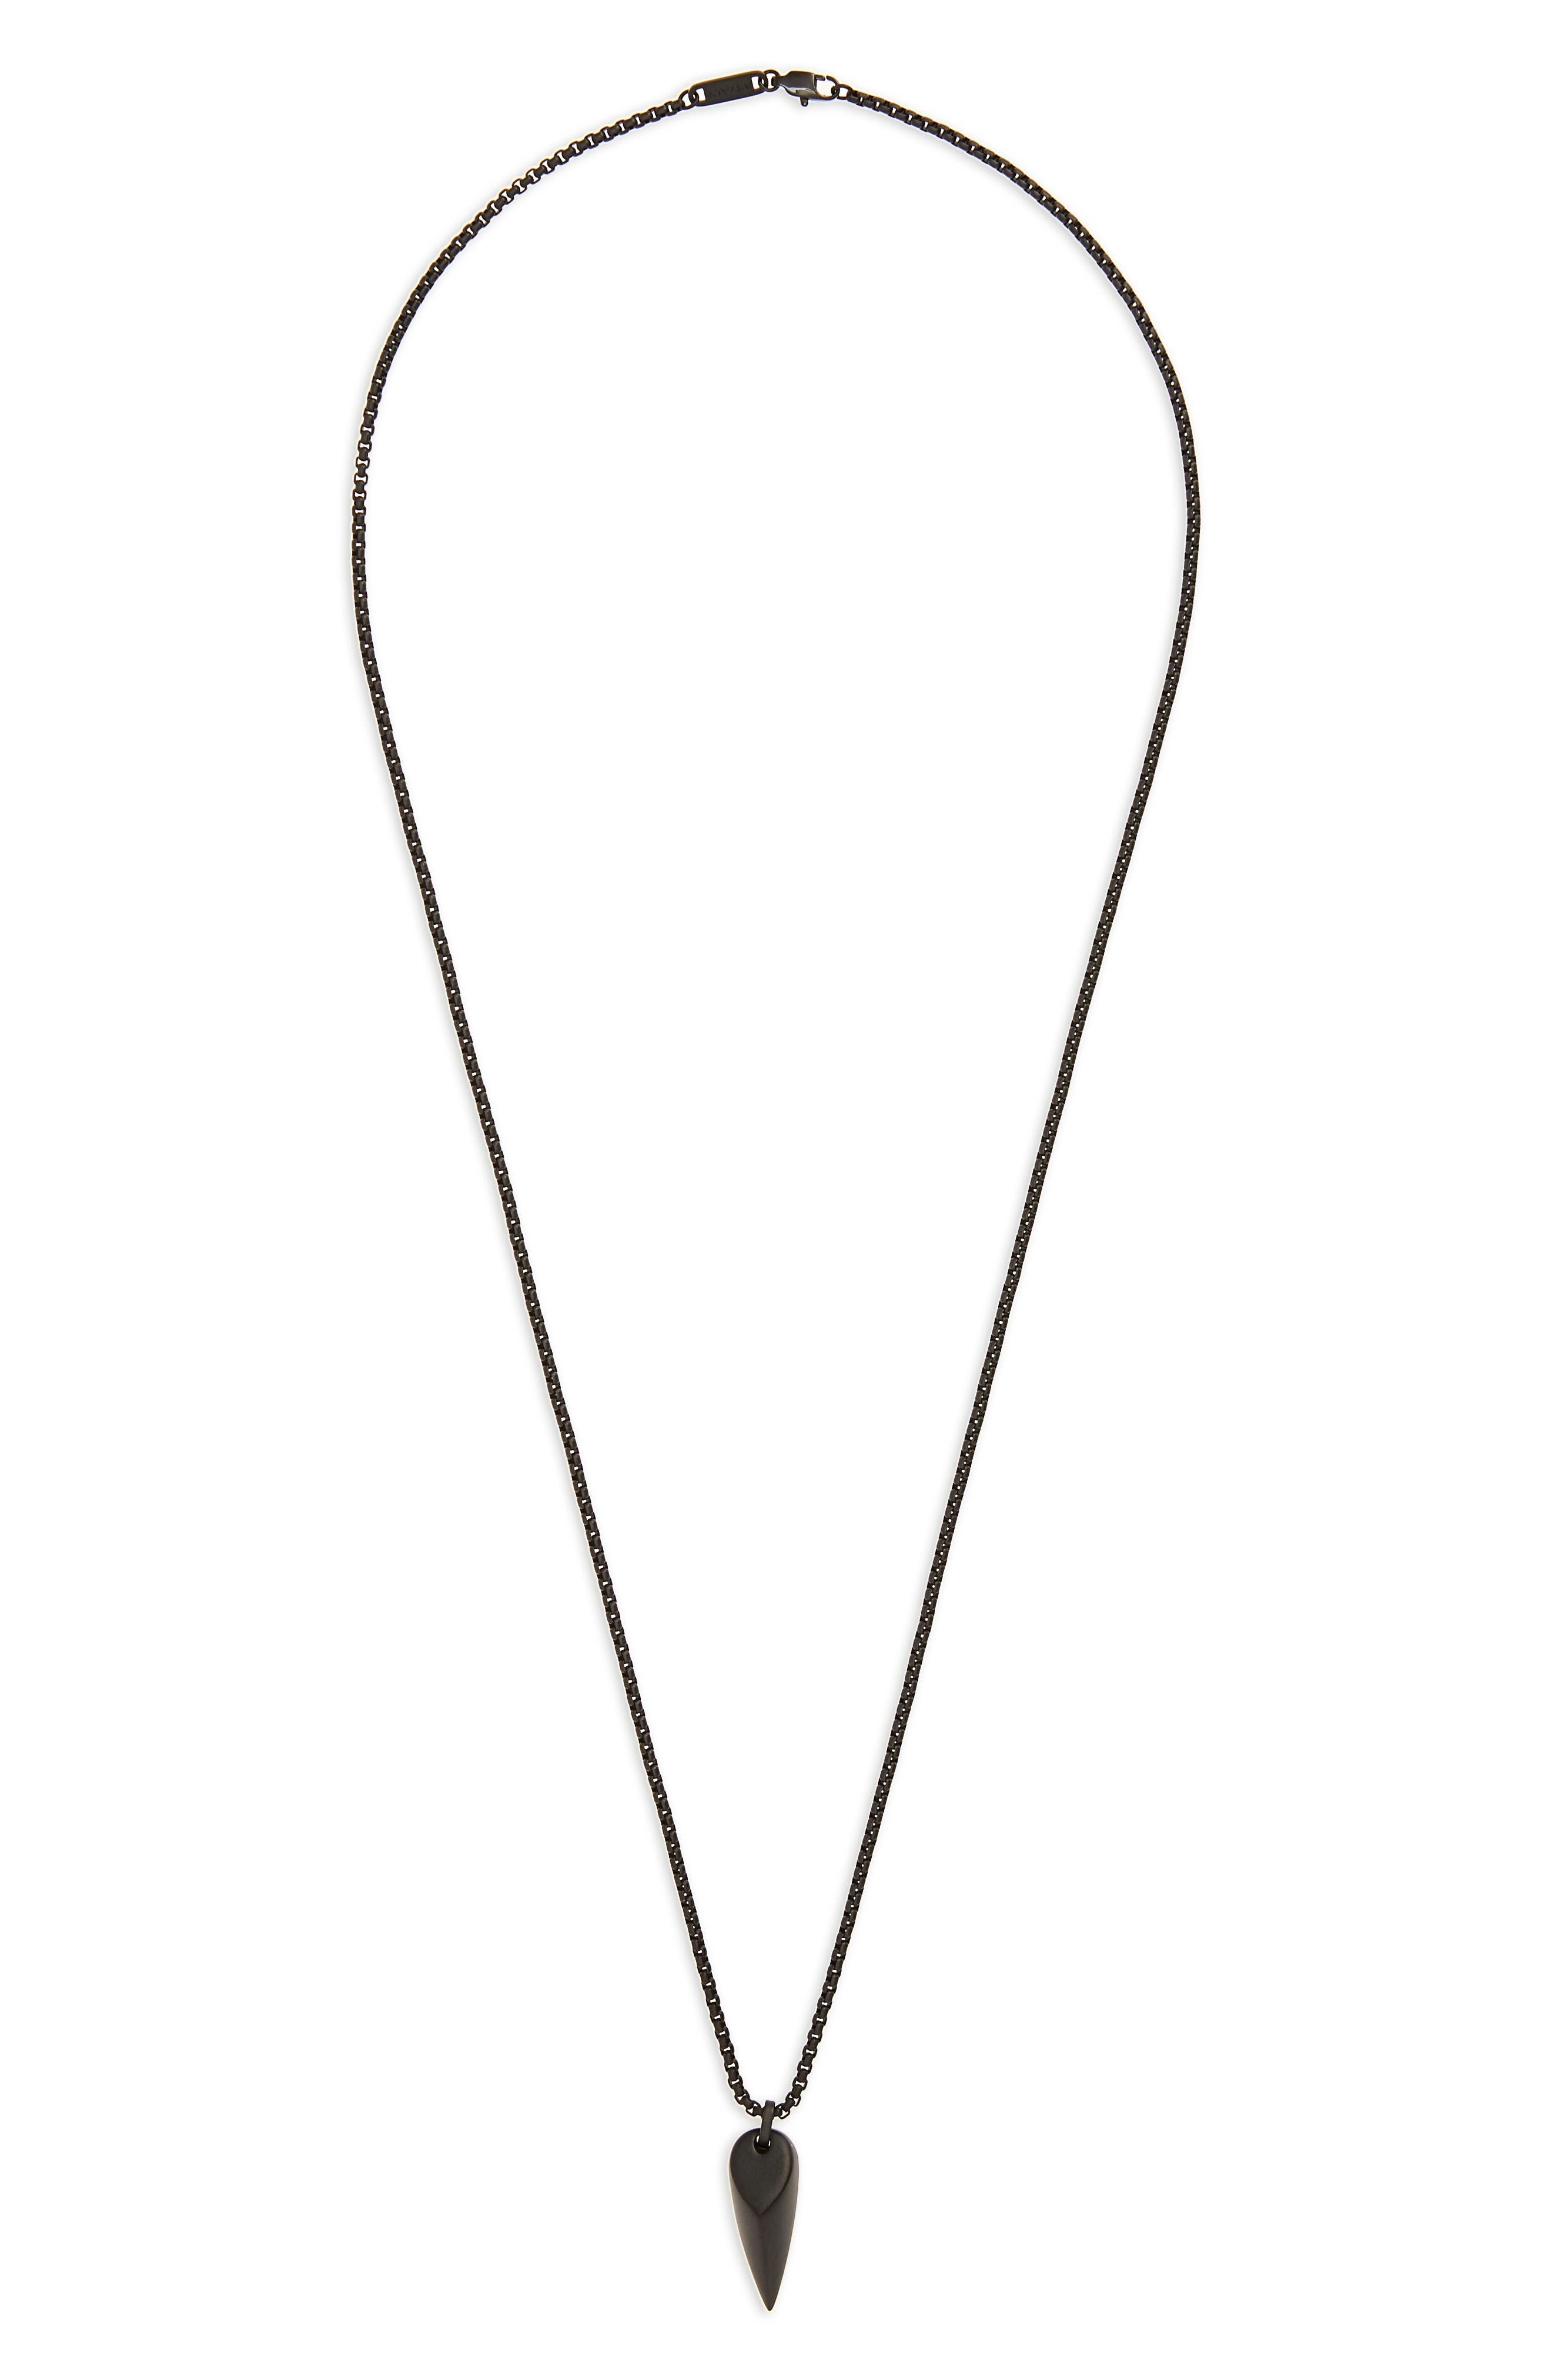 Main Image - Vitaly Corvus Pendant Necklace